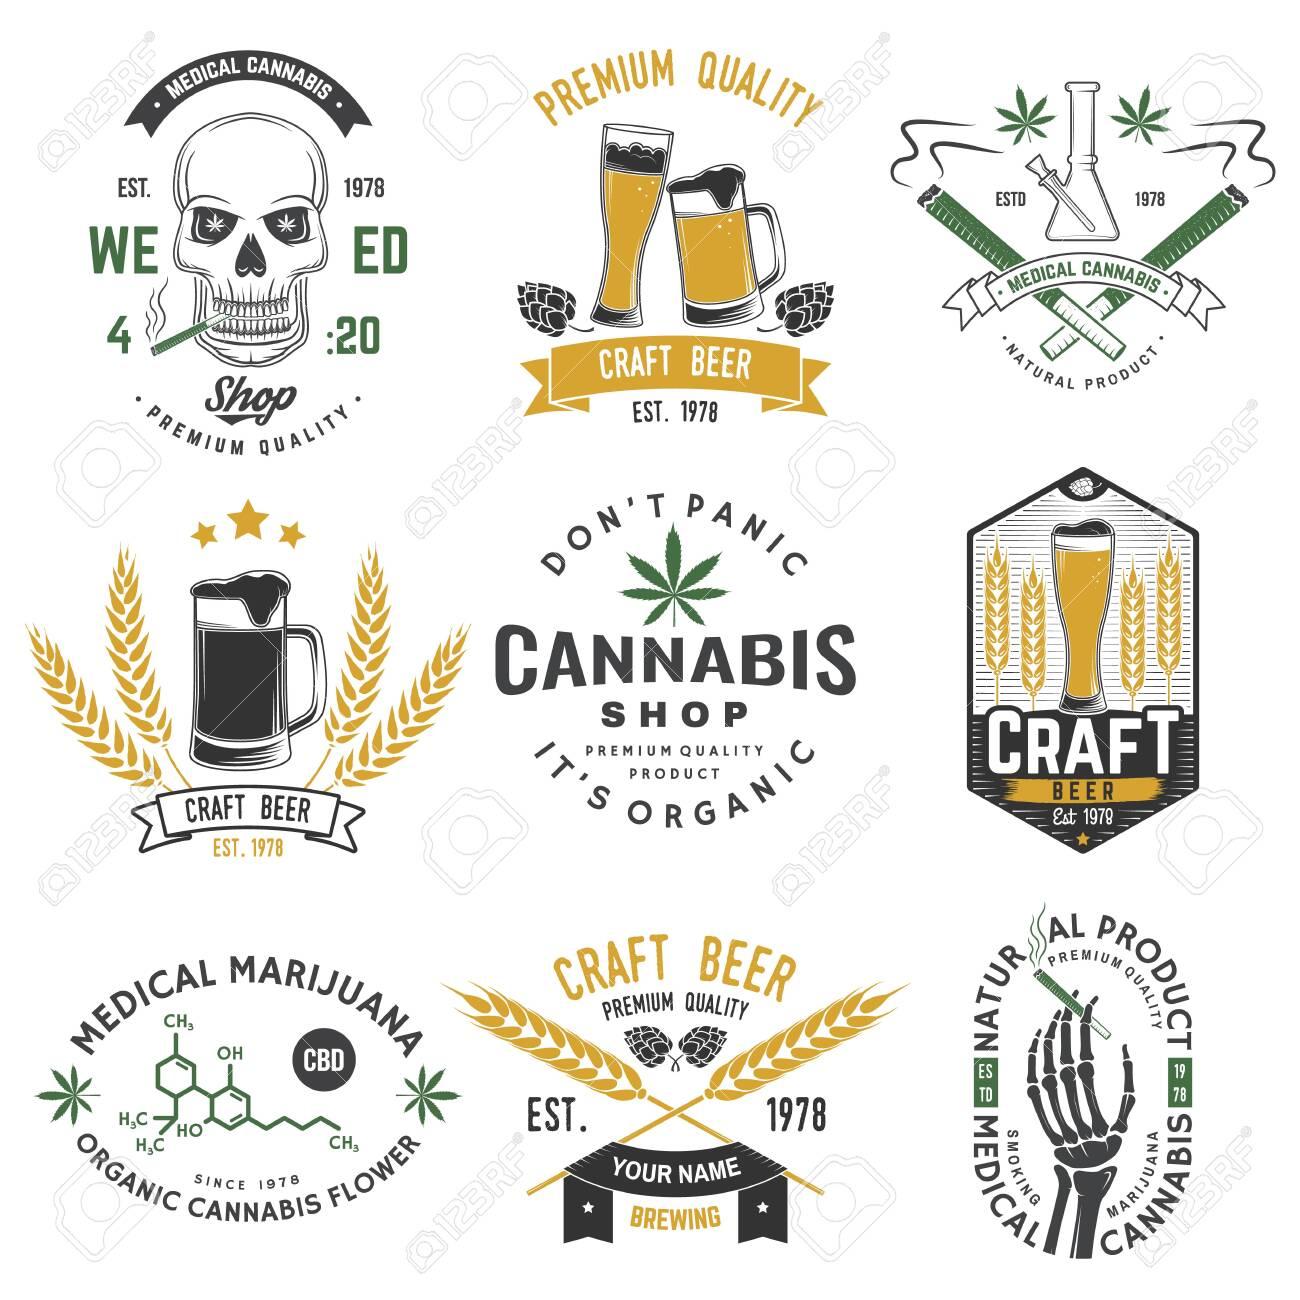 Set of medical cannabis and craft beer badge, label with skull, skeleton hand, smoking marijuana. Vector illustration. For weed shop, marijuana delivery, bar, pub - 153211187